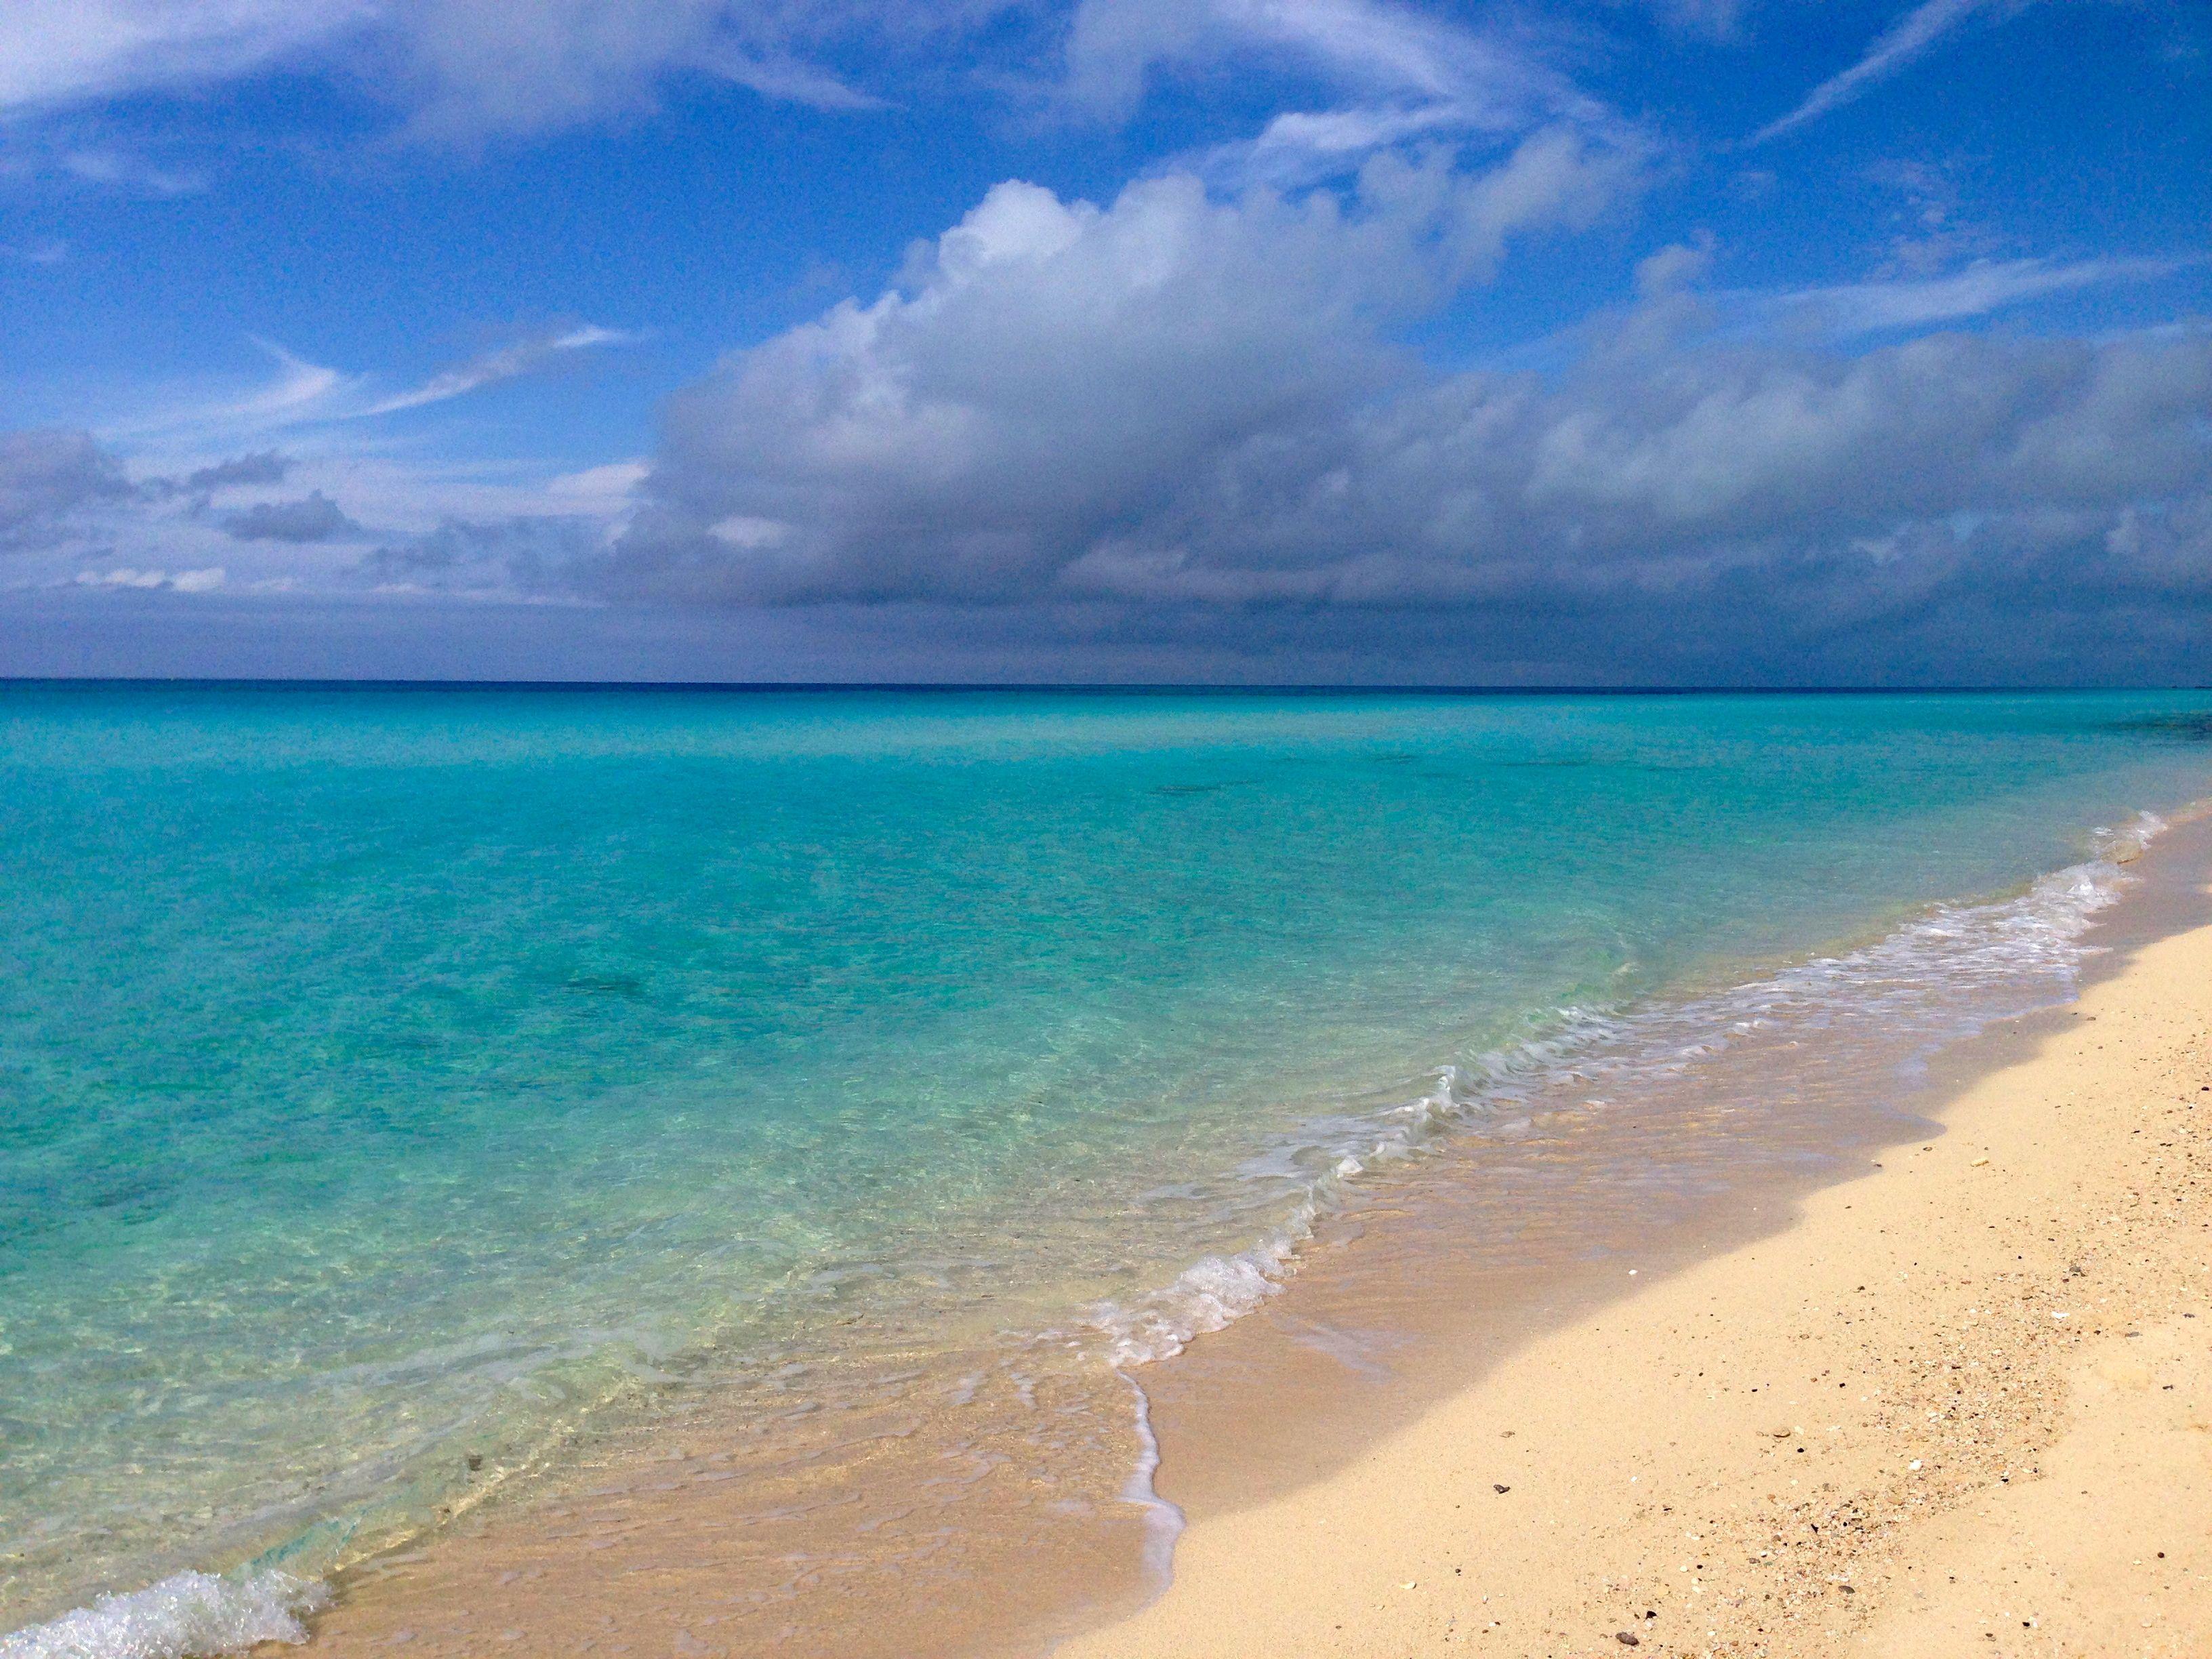 Real Beaches Near Me